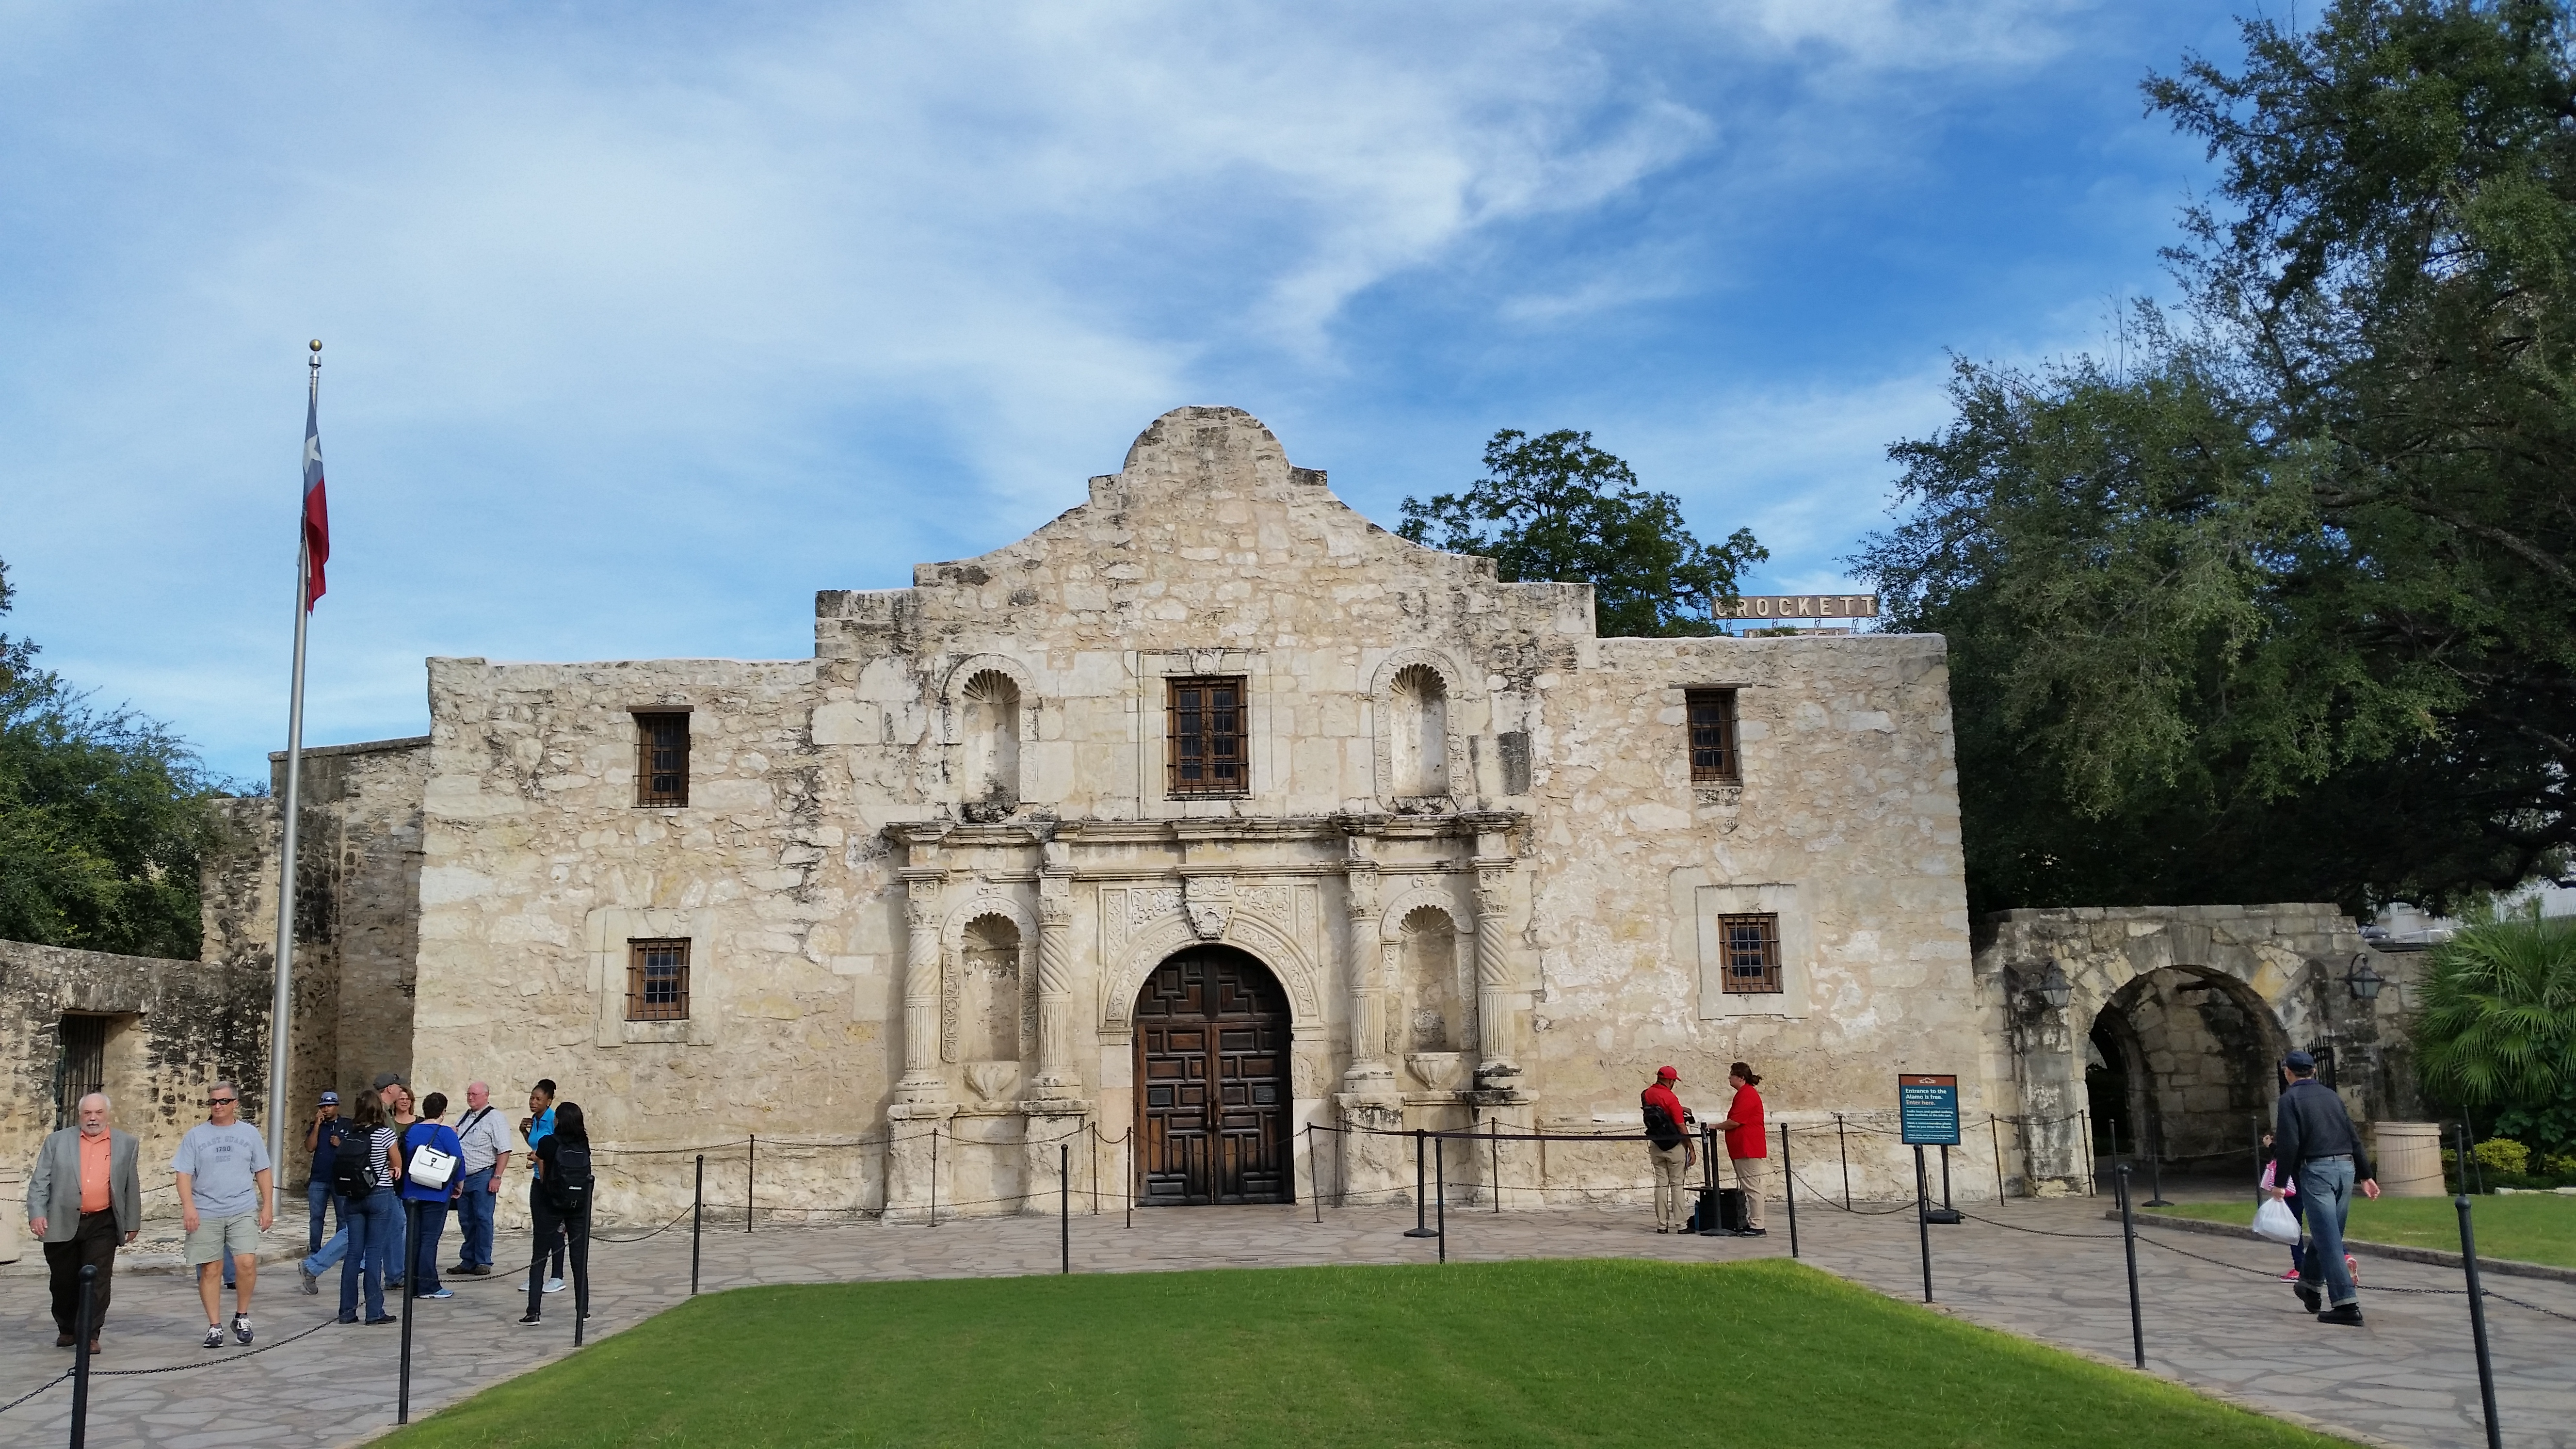 2017 Austin Exchange - October 12 - 17 - The Alamo